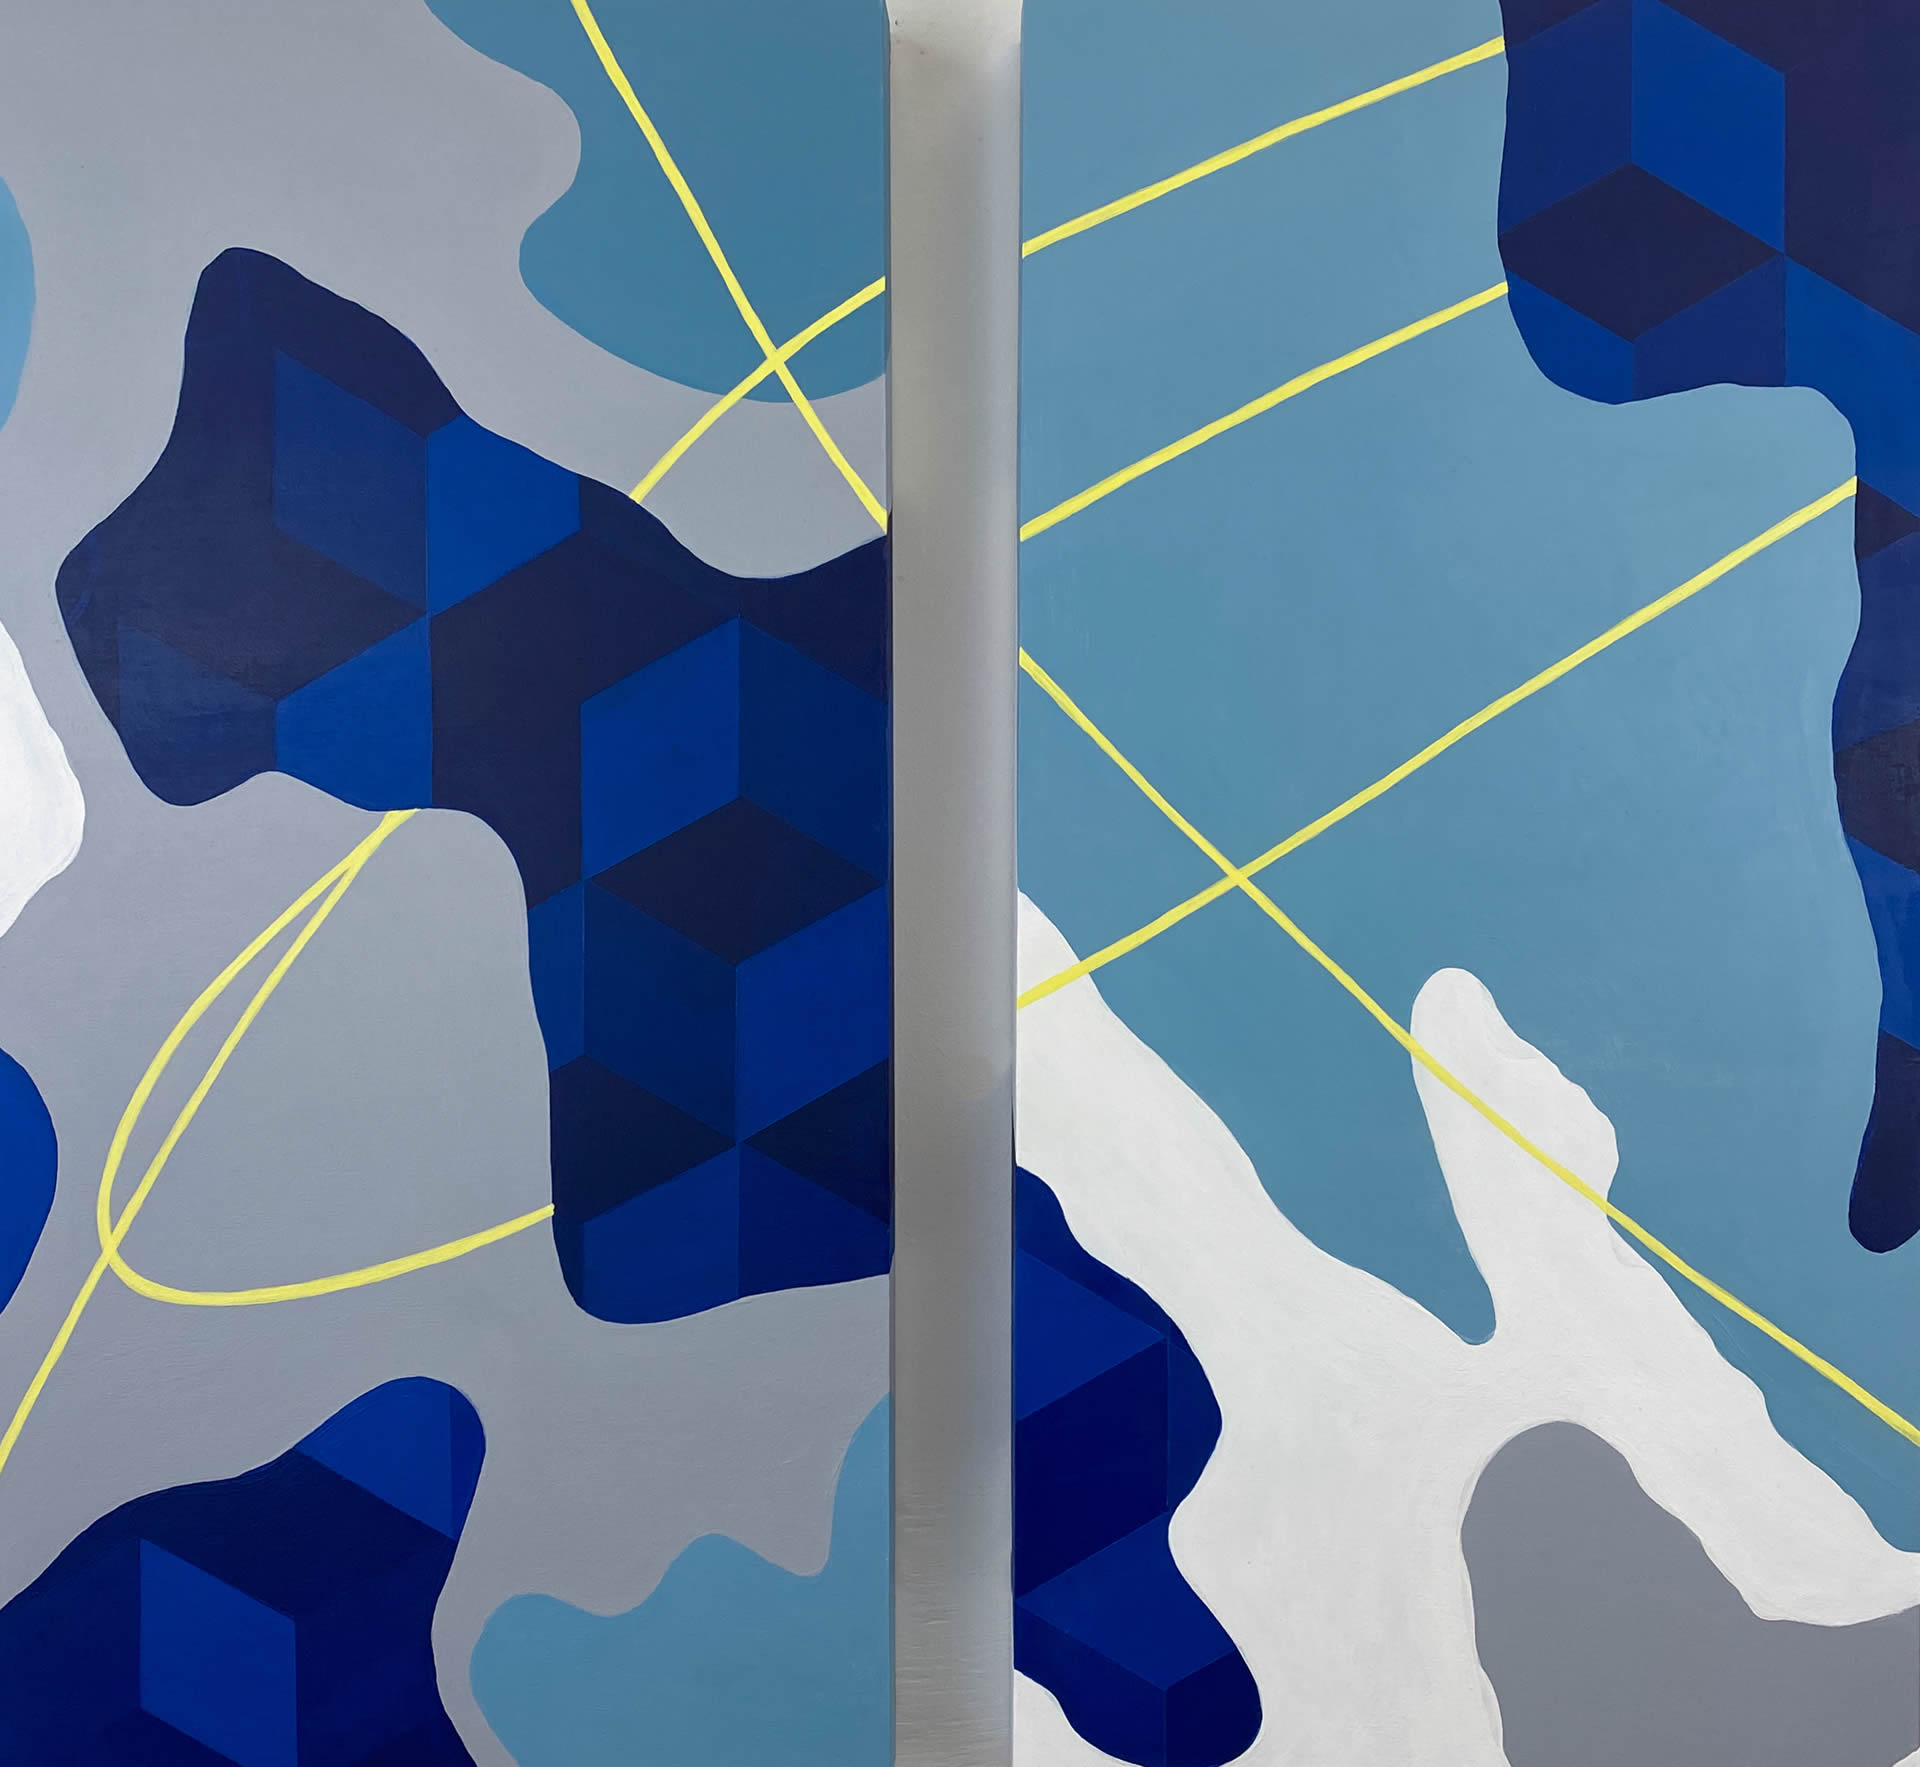 Tristesse-Seeliger-Flight-Plan-6-24x24-Online-Art-Galleries